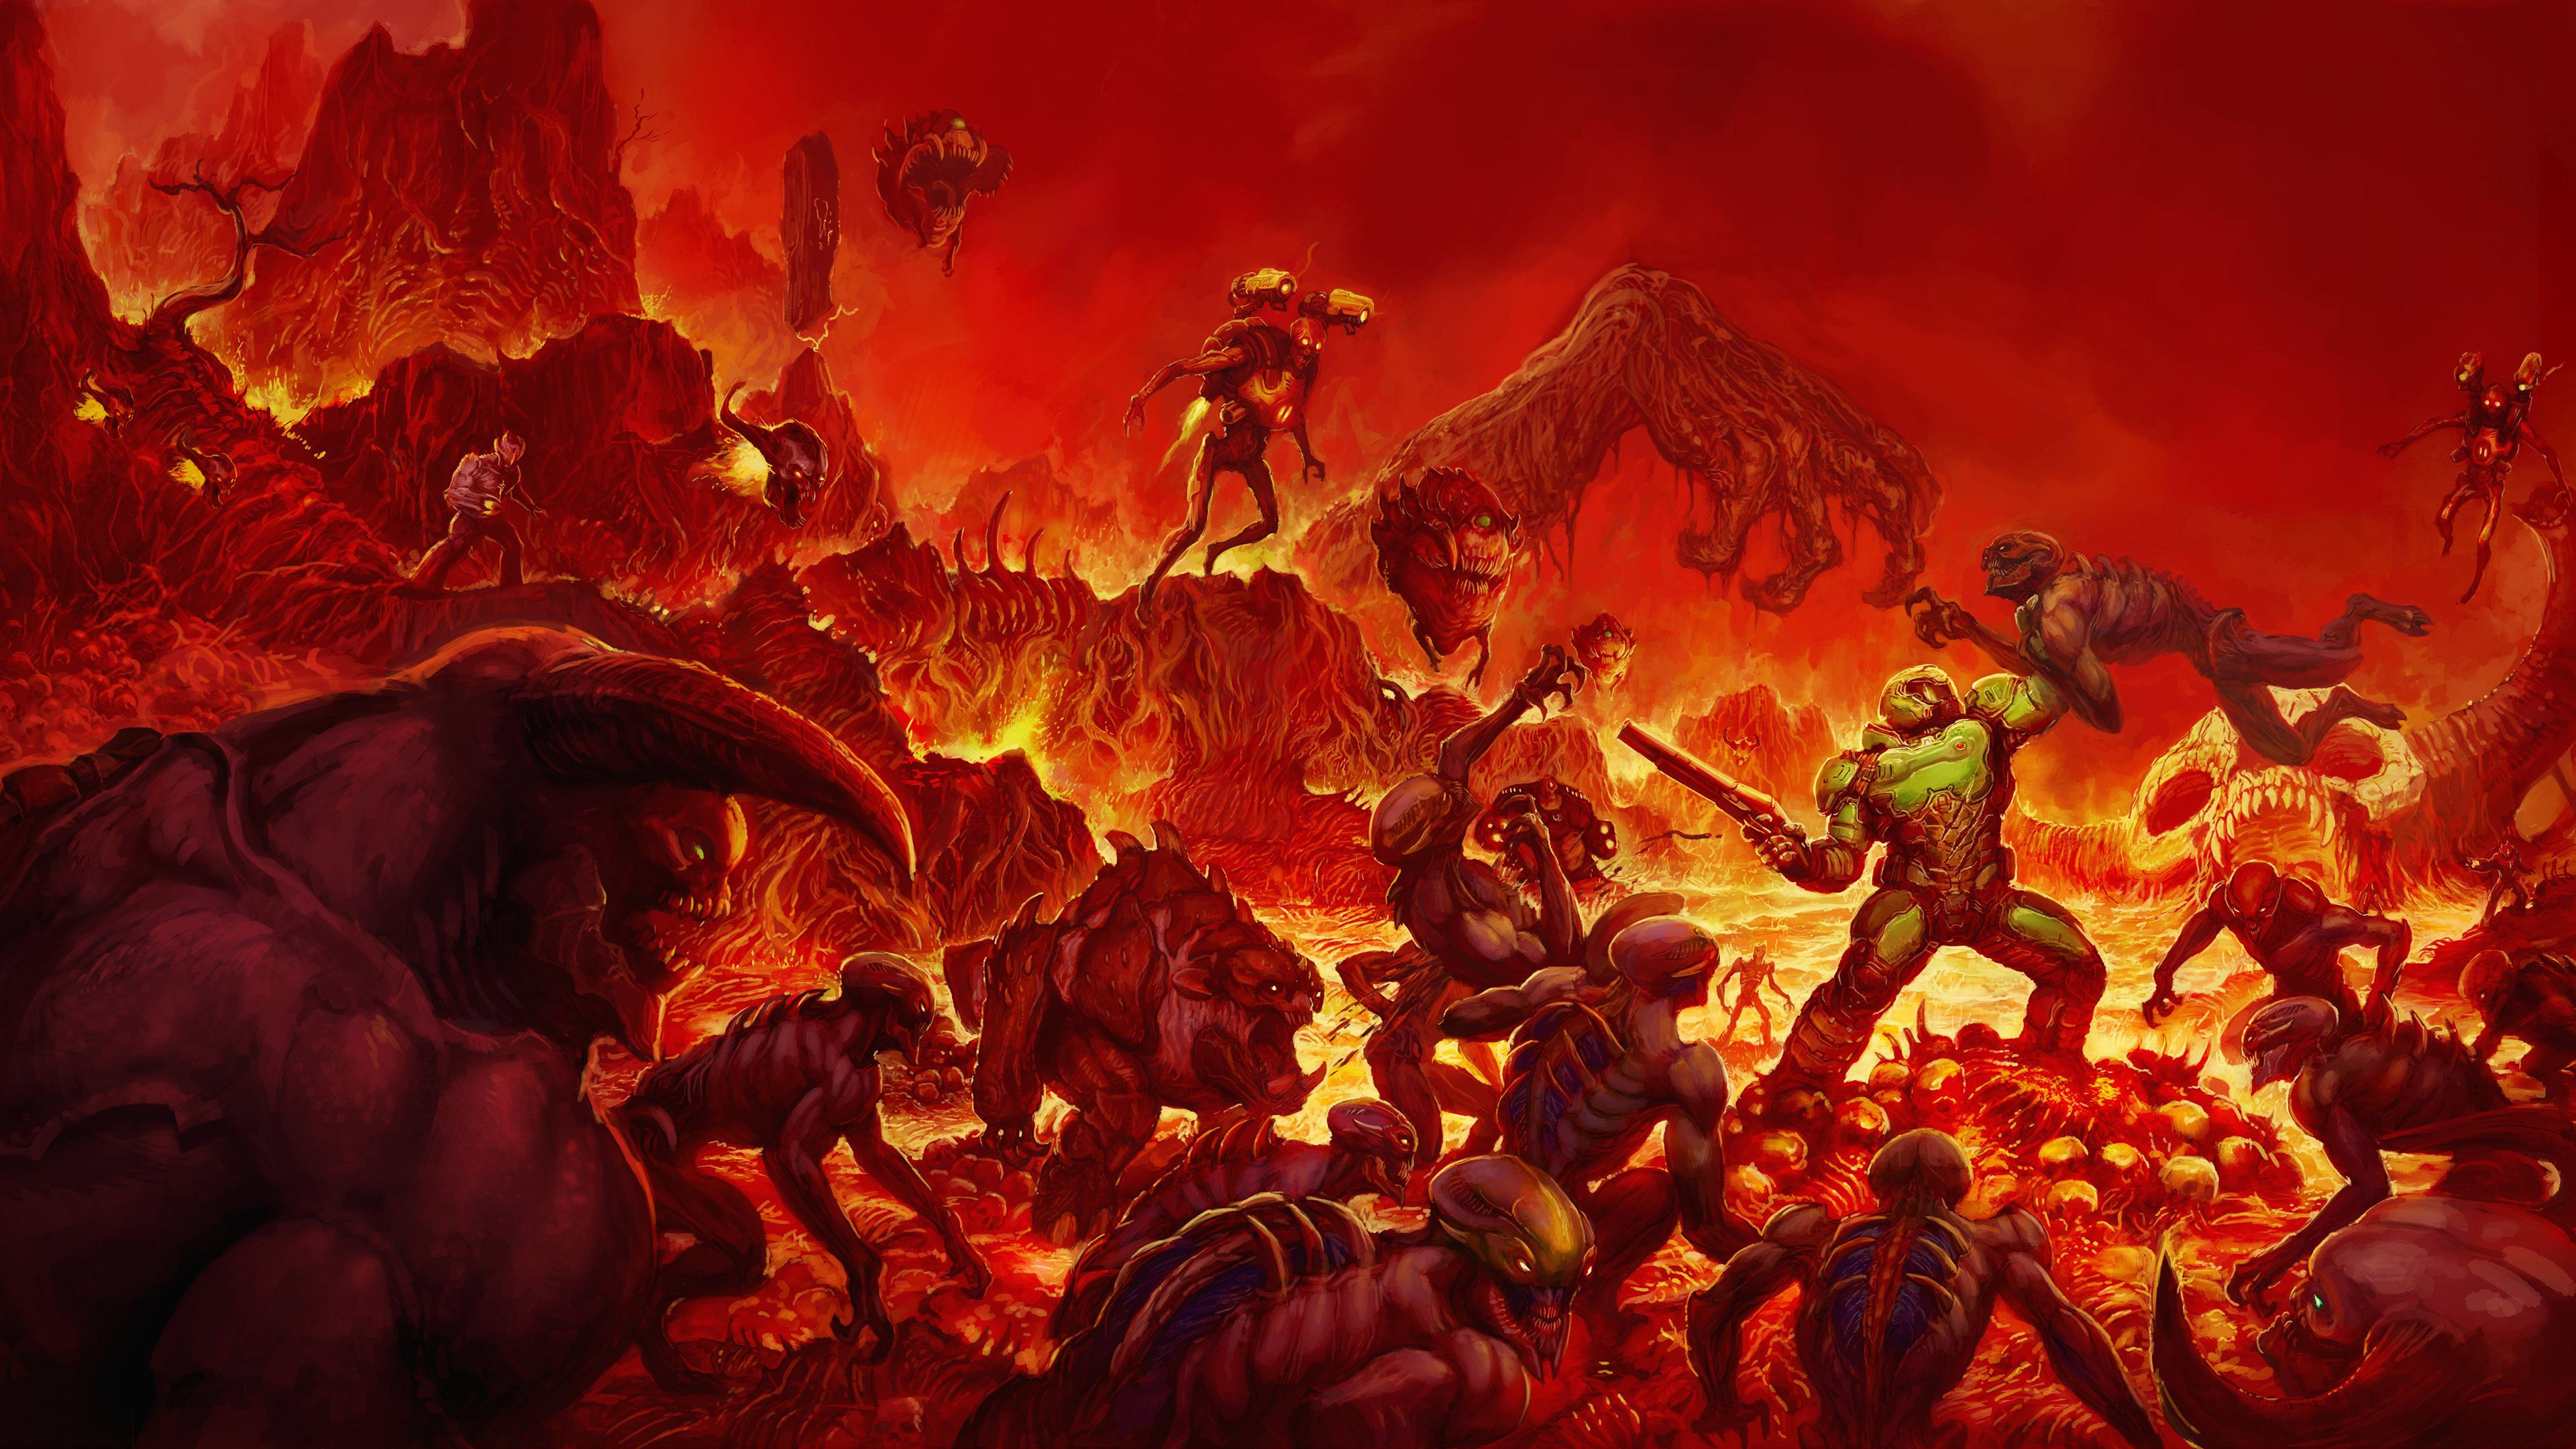 Doom Free Uhd Backgrounds Jpg Izobrazhenie Jpeg 3840 2160 Pikselov Masshtabirovannoe 46 Doom Game Doom 2016 Doom Cover